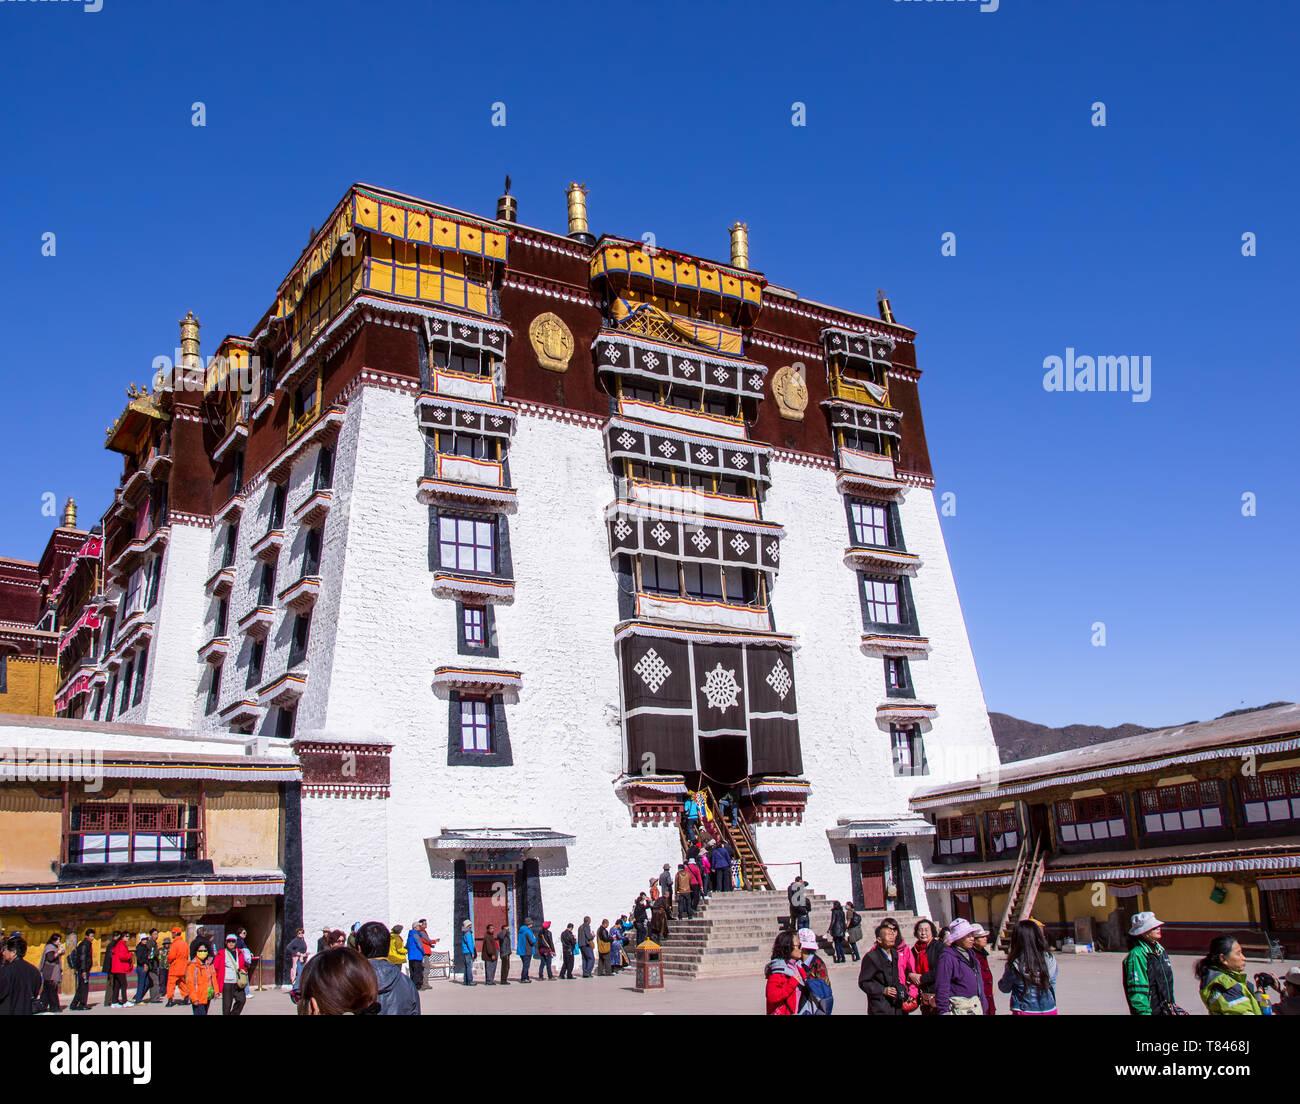 Main entrance to Potala Palace - Lhasa, Tibet - Stock Image